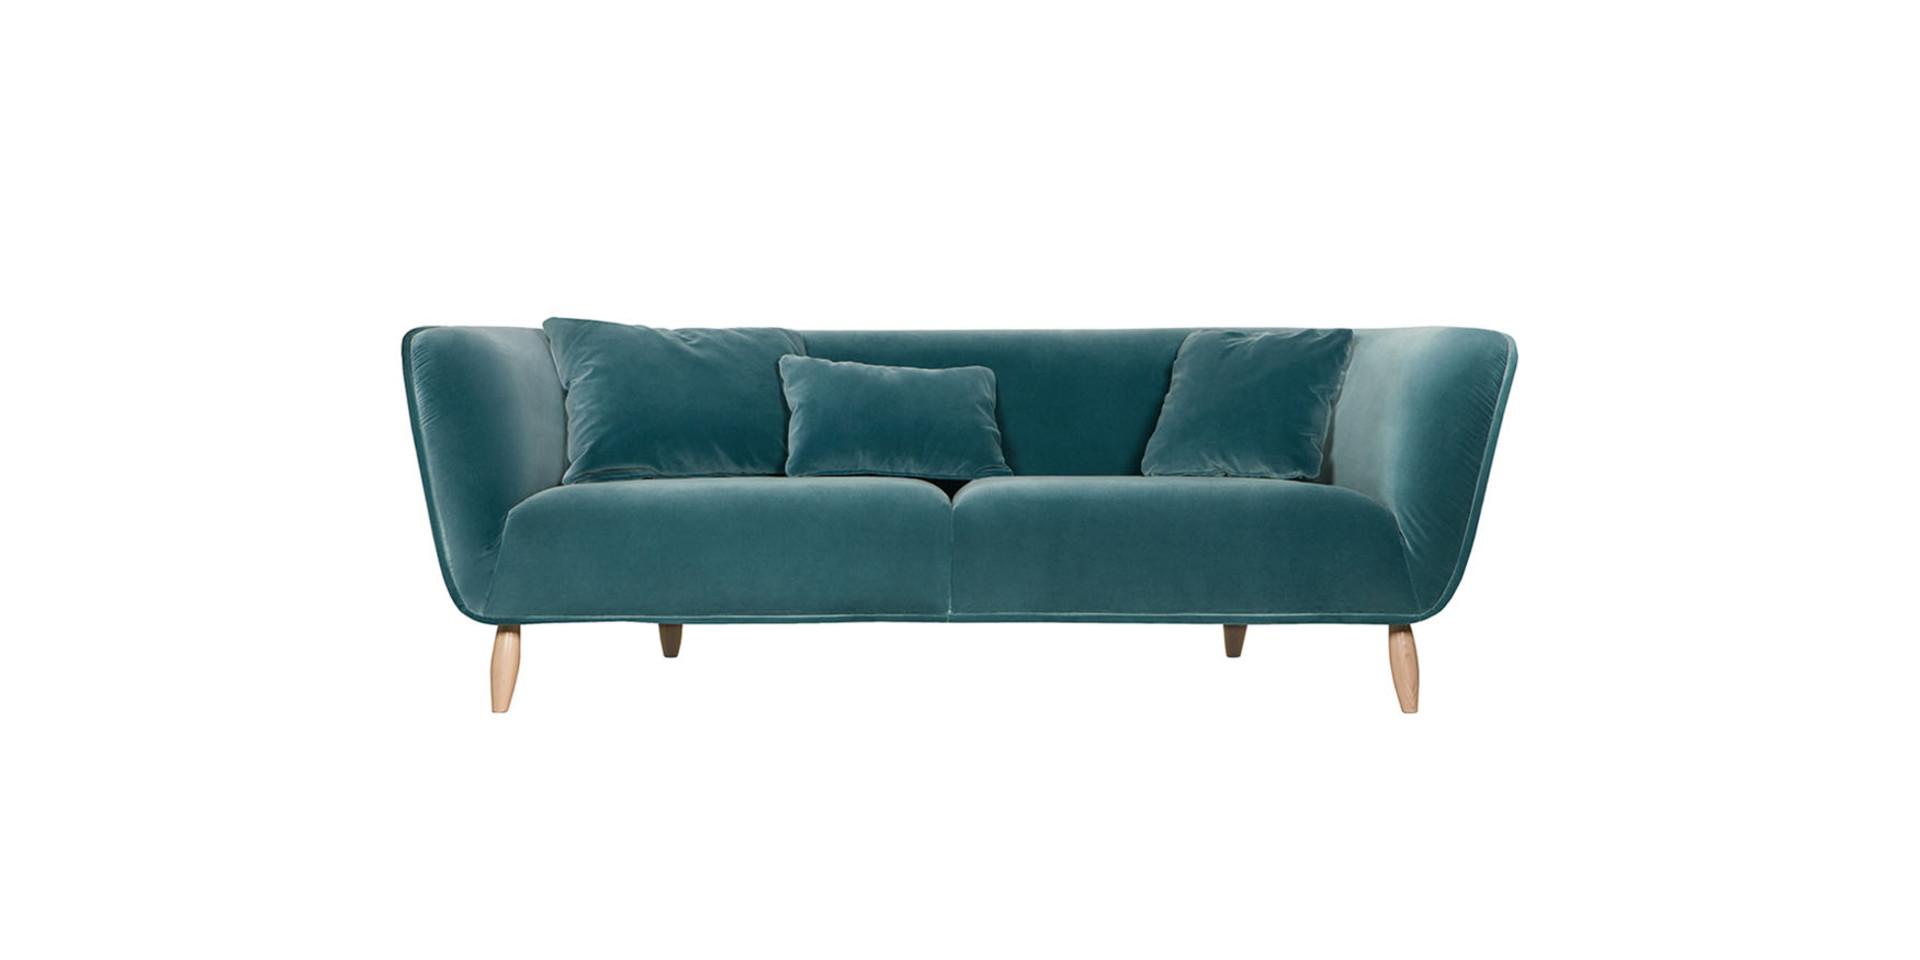 sits-maja-canape-3seater_lario1406_turquoise_1_0